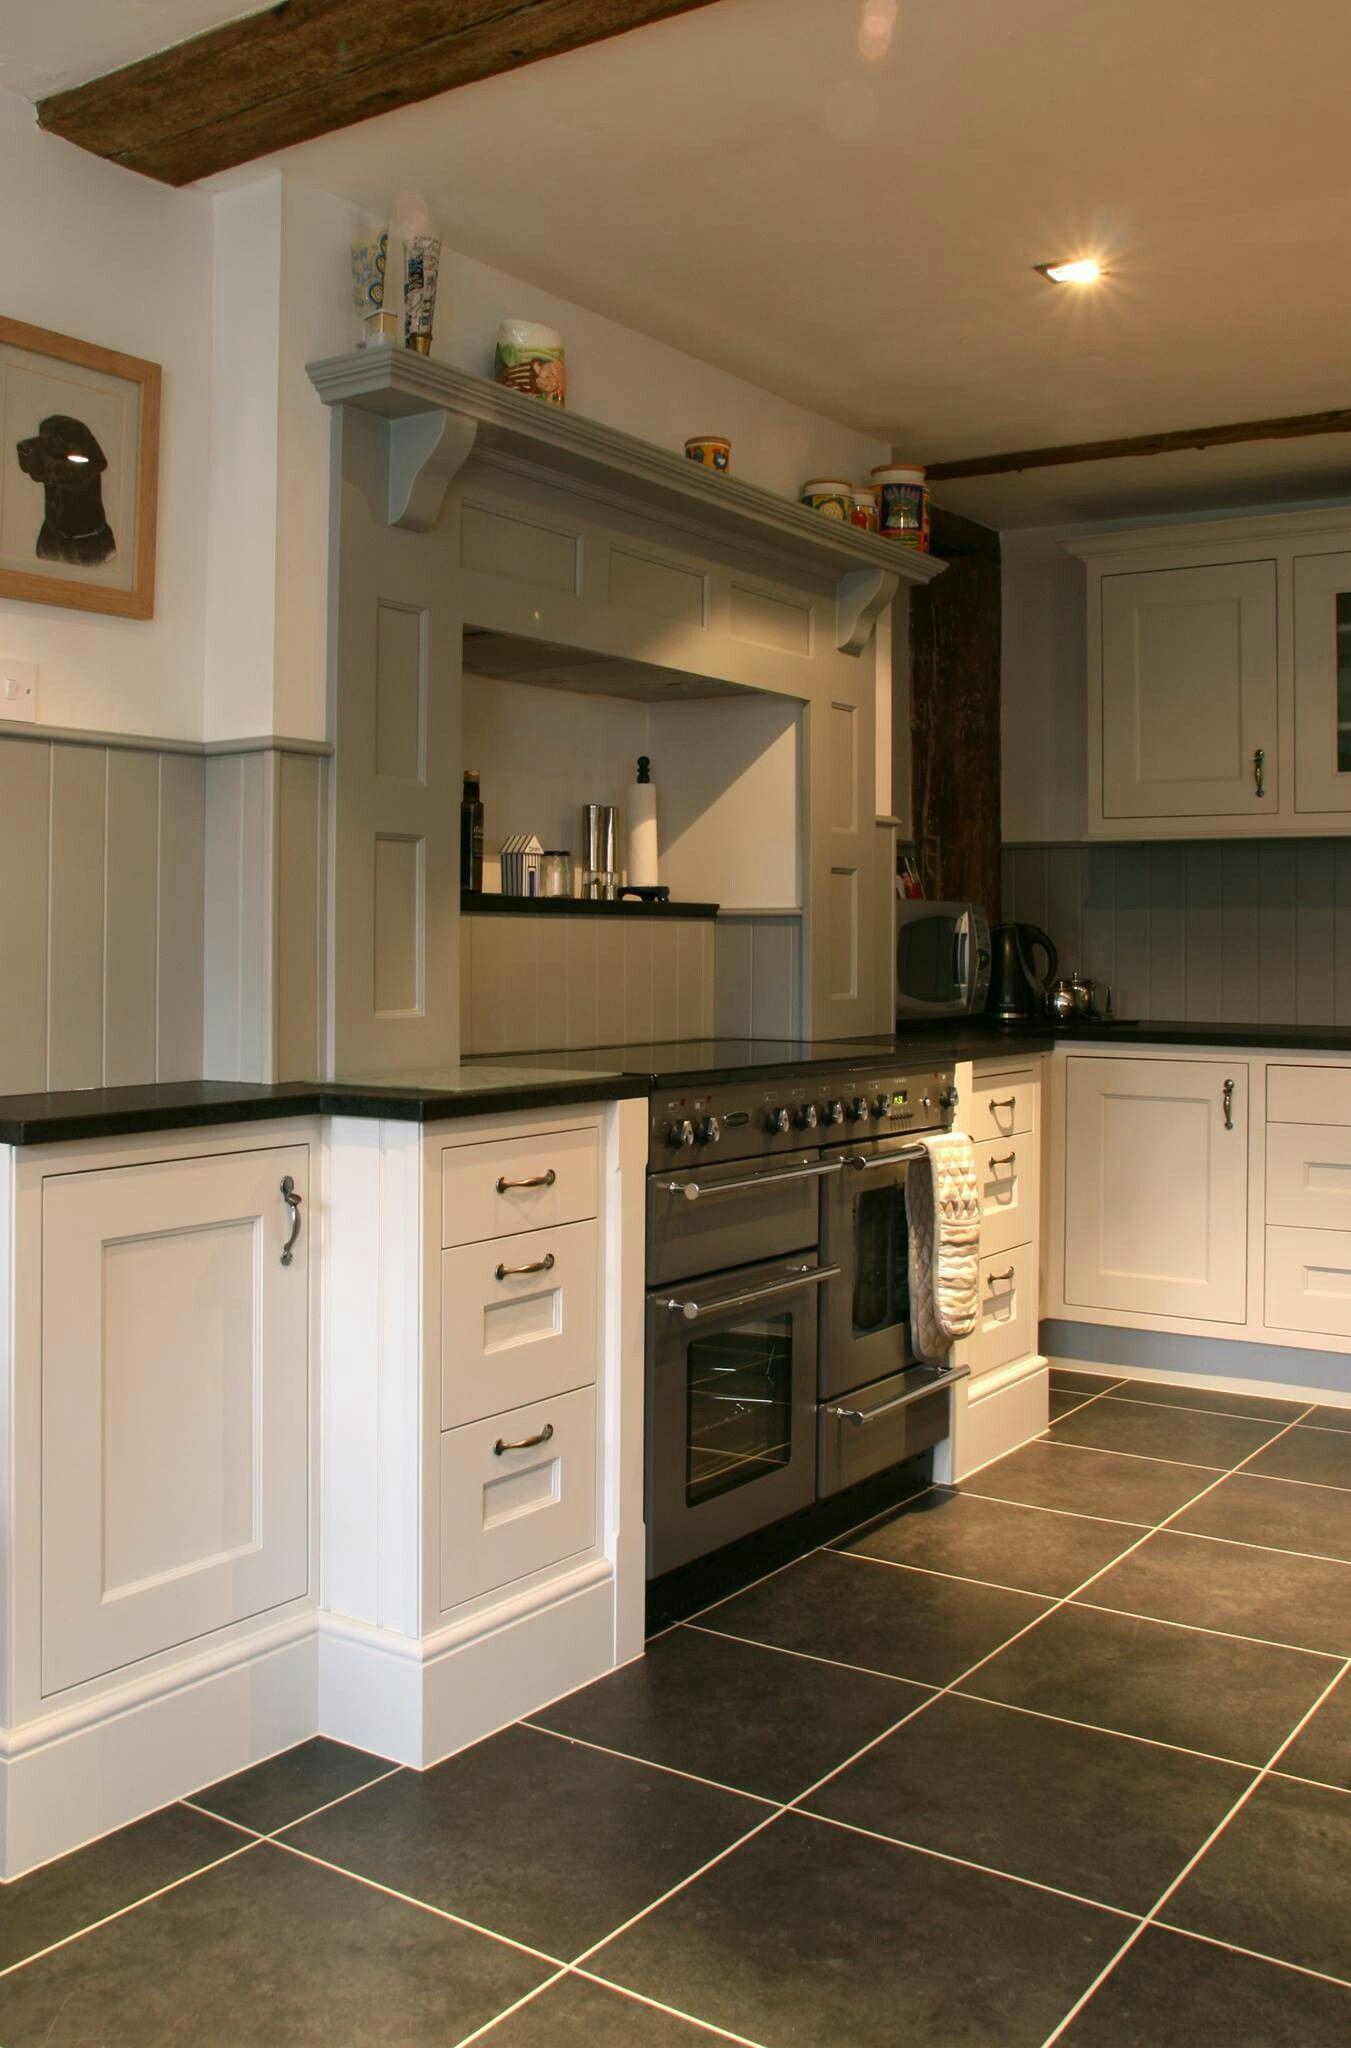 Change furniture in the kitchen 49